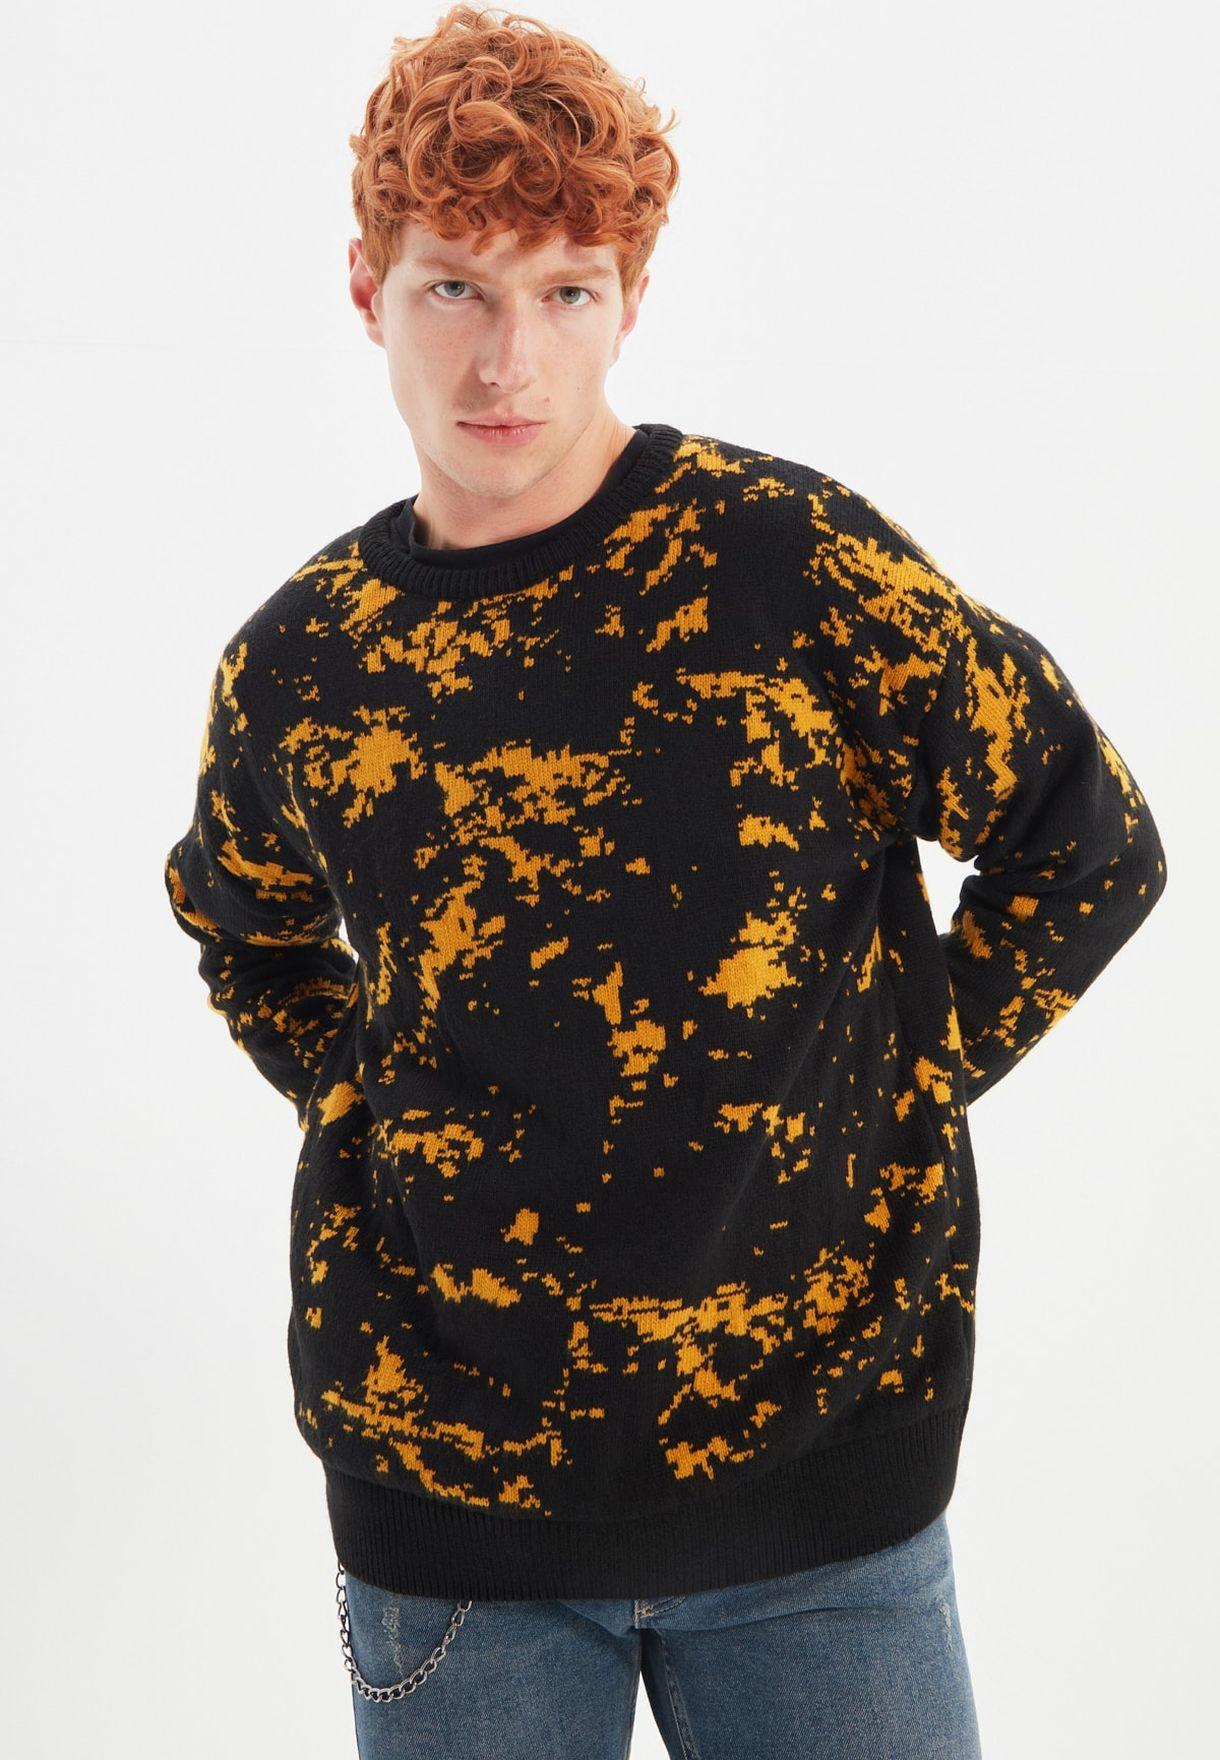 Splash Effect Knitted Sweater